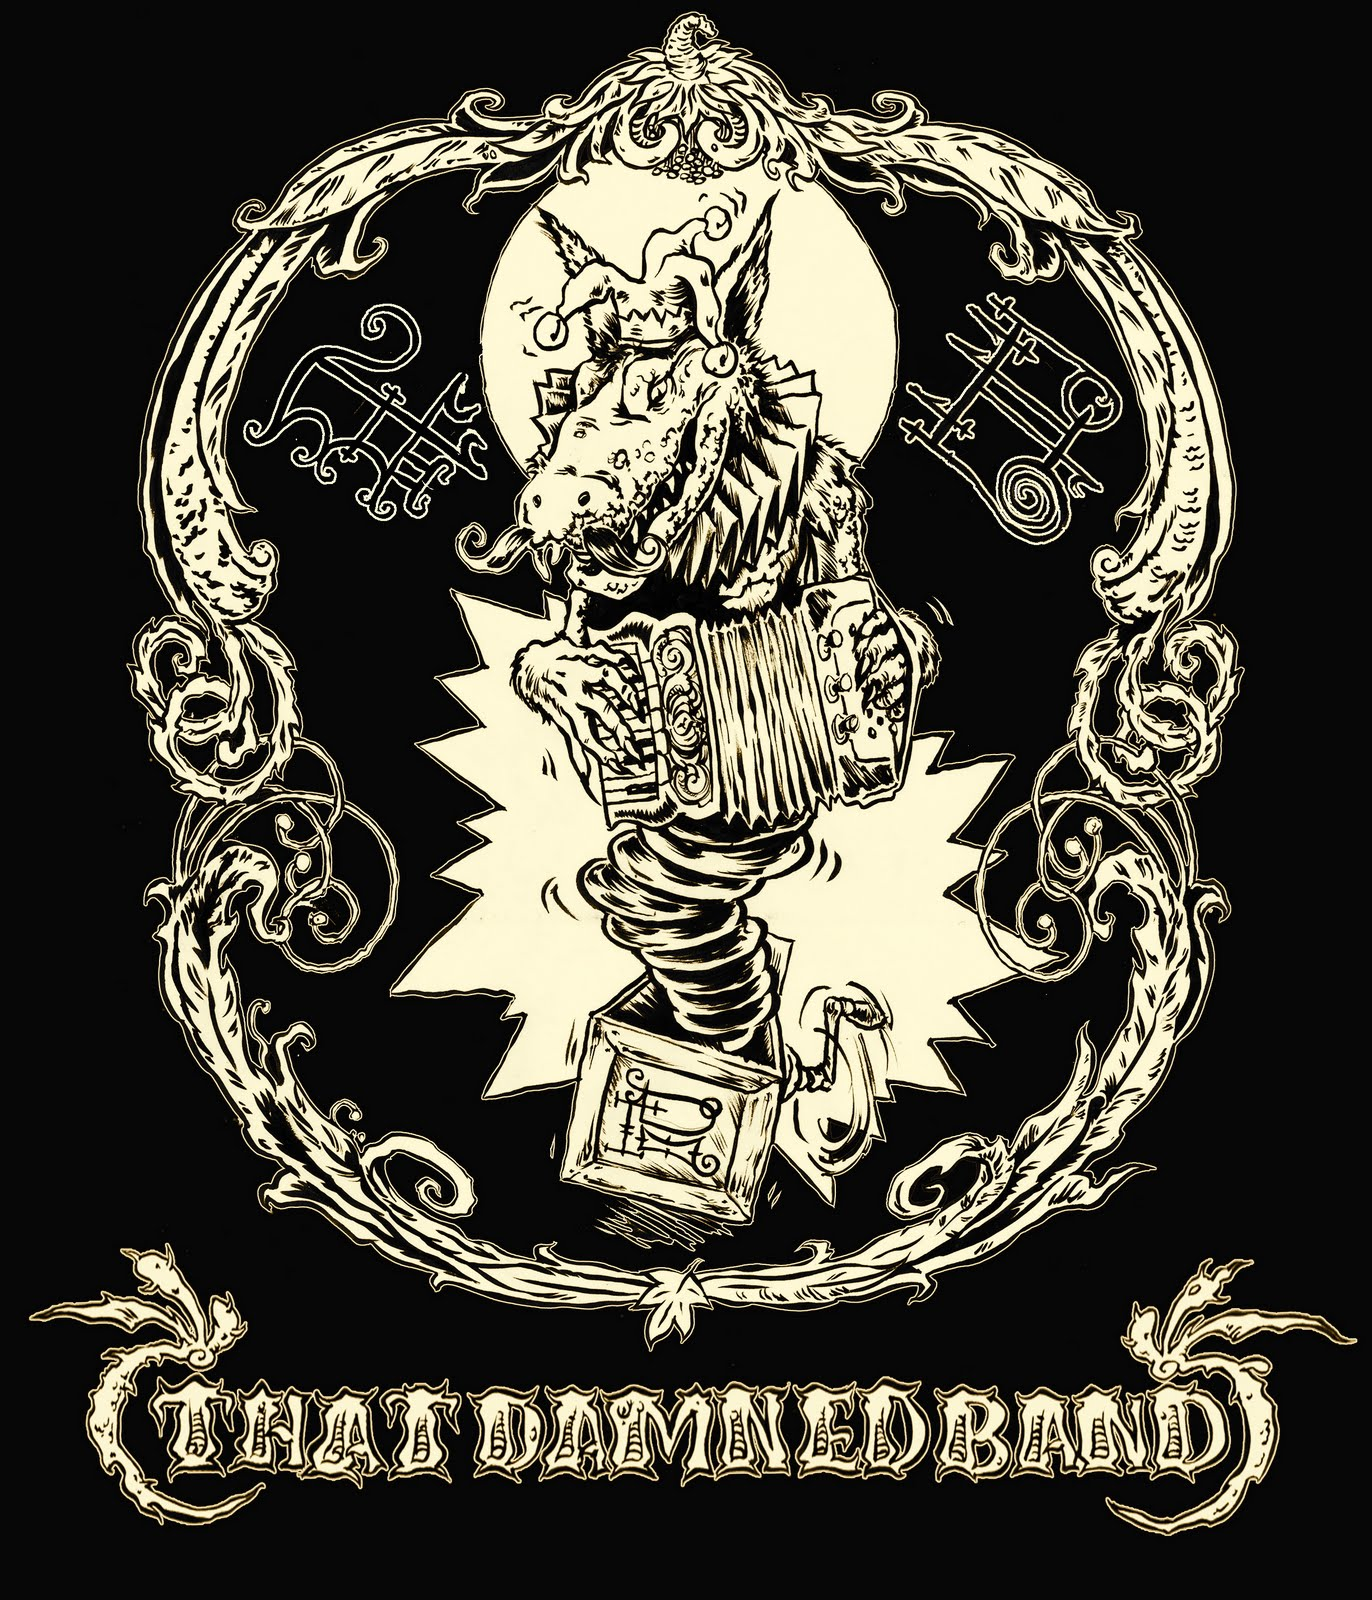 Gatorhorse Studio That Damned Band T Shirt Design